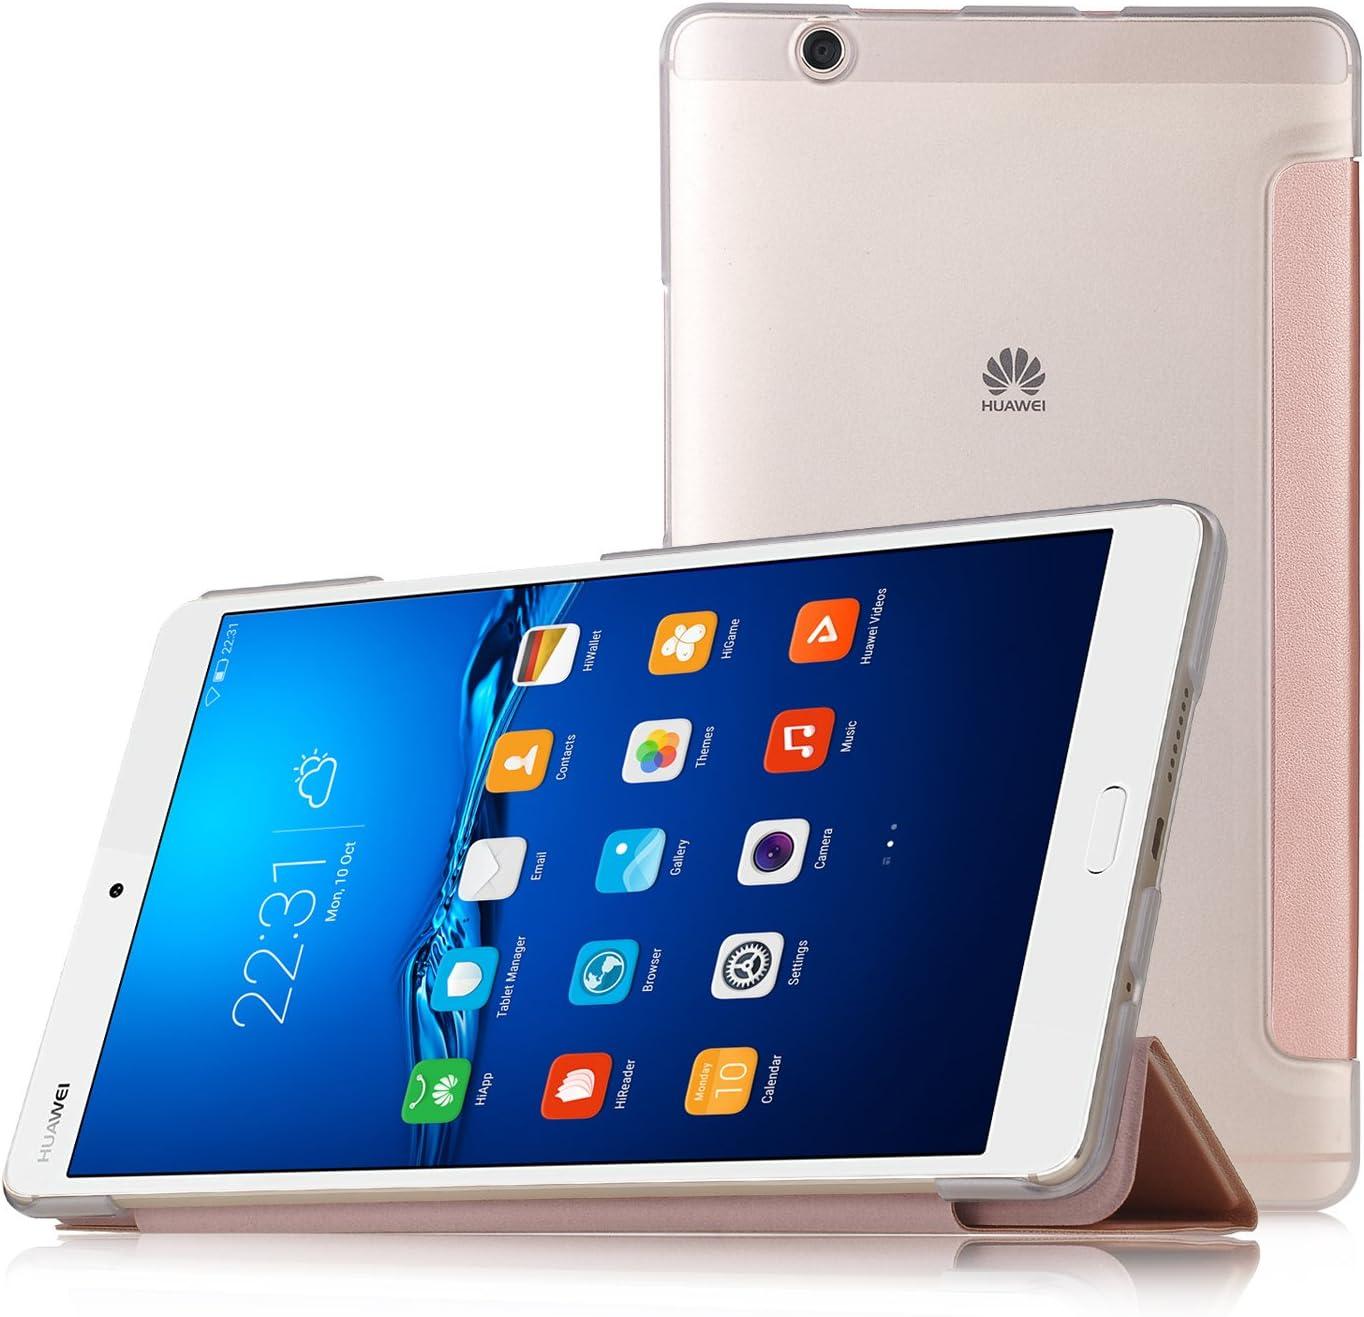 IVSO Huawei MediaPad M3 8.4 Cover Custodia - Slim Smart Cover Custodia Protettiva in Pelle PU per Huawei MediaPad M3 8.4 (2016 Version) Tablet, Oro ...